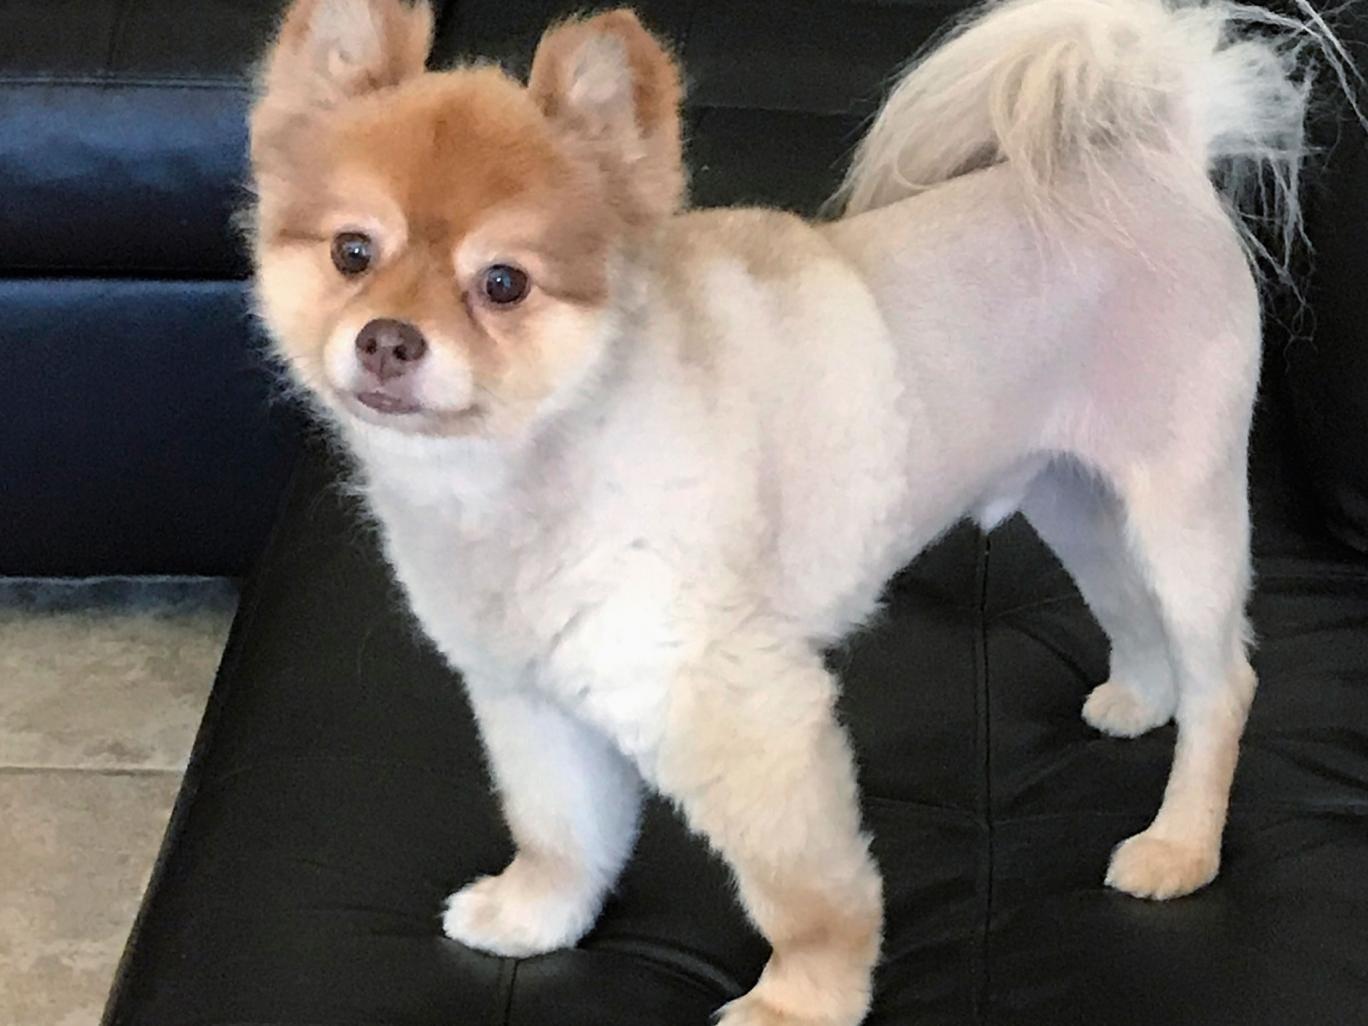 Bloody Blanket Found With Dead Pomeranian Dog After Delta Flight